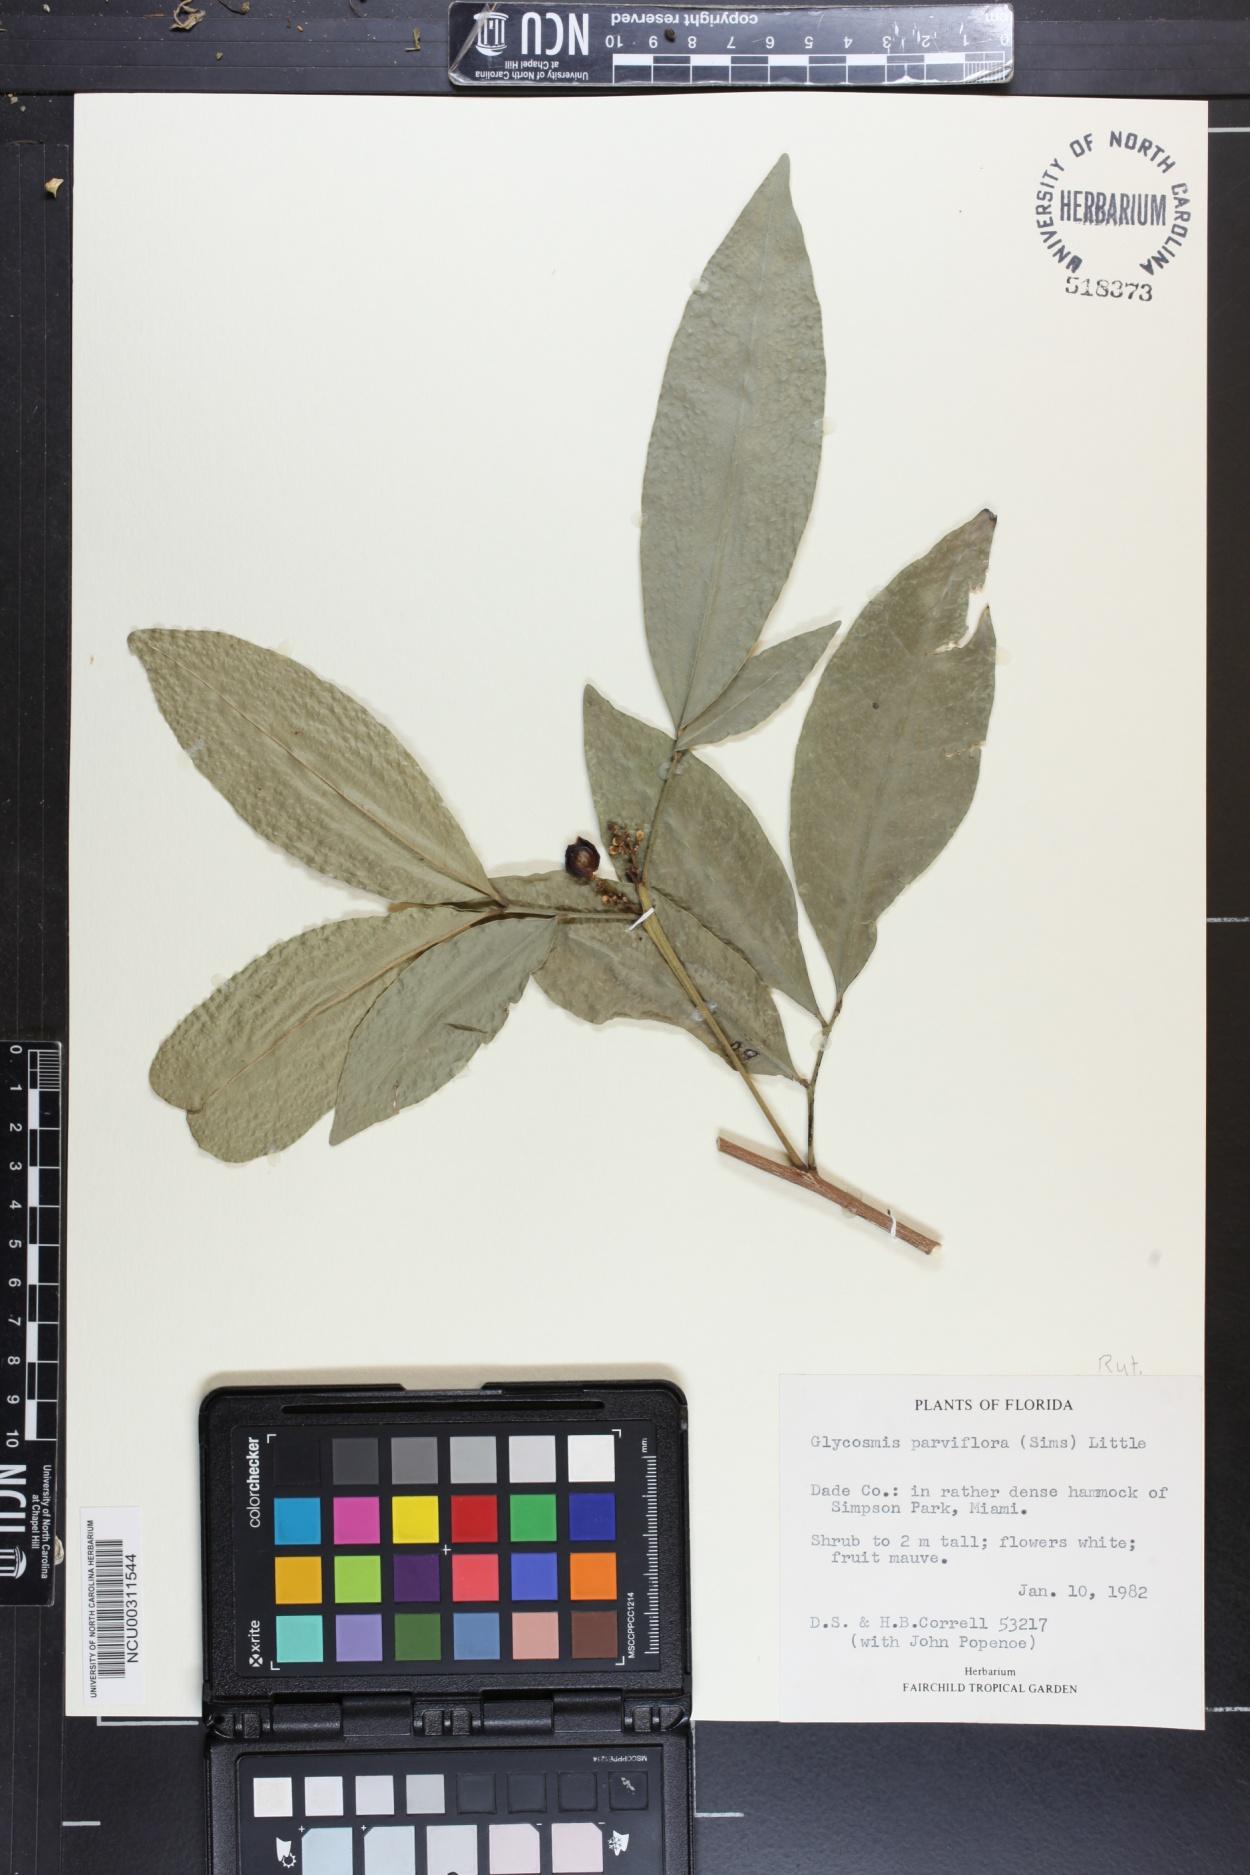 Glycosmis parviflora image